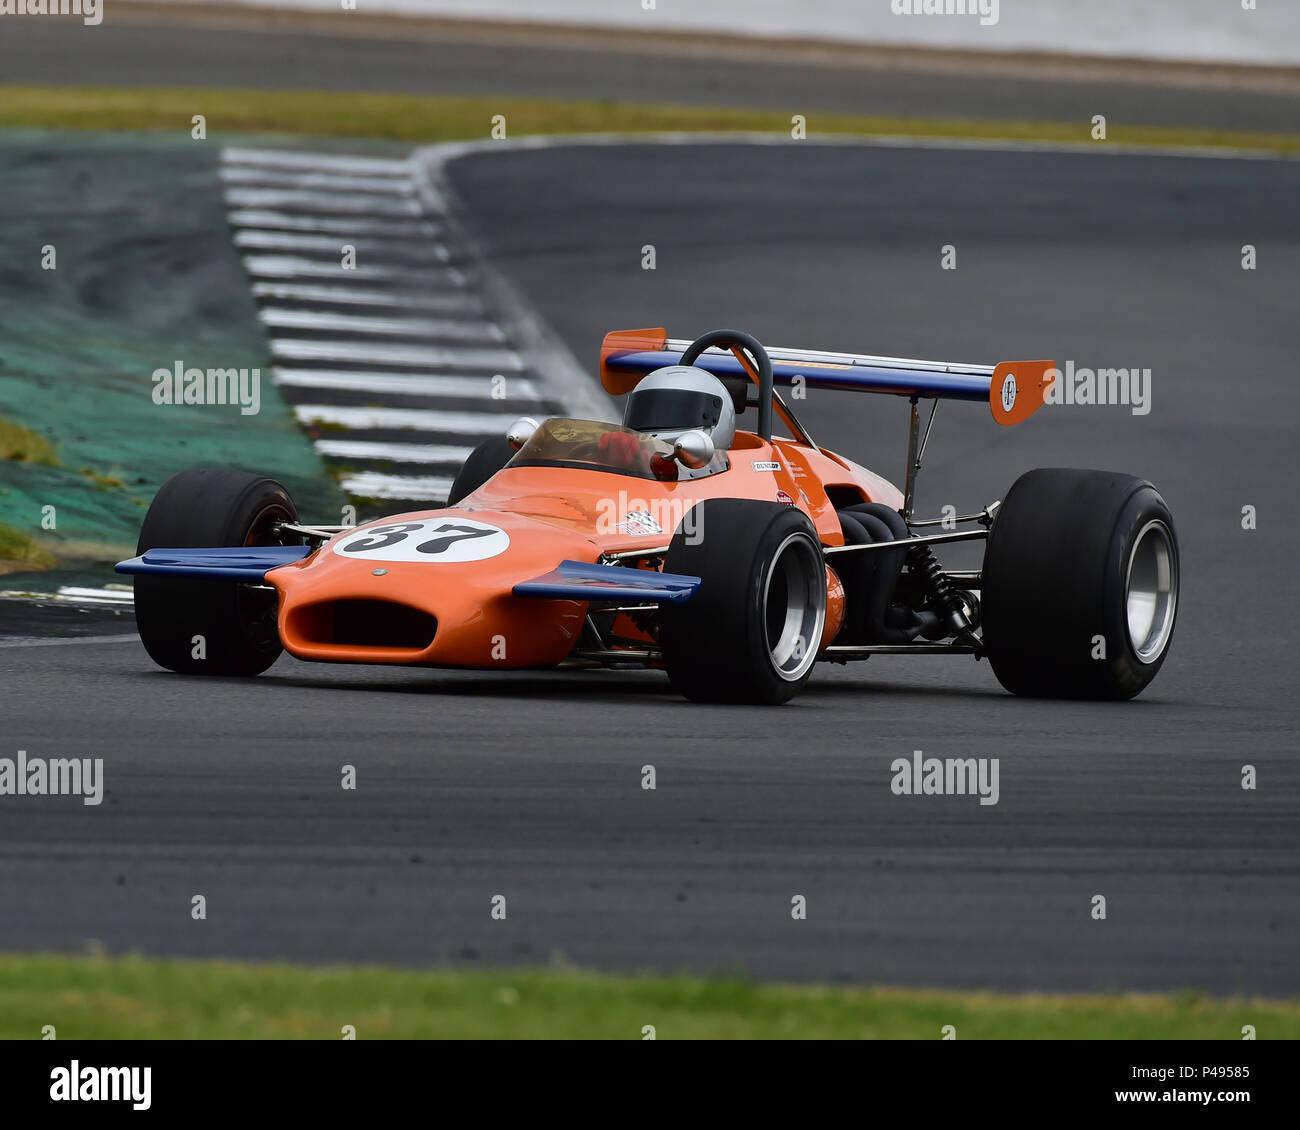 Lincoln Small Brabham Bt30 Historic Formula 2 Fia International